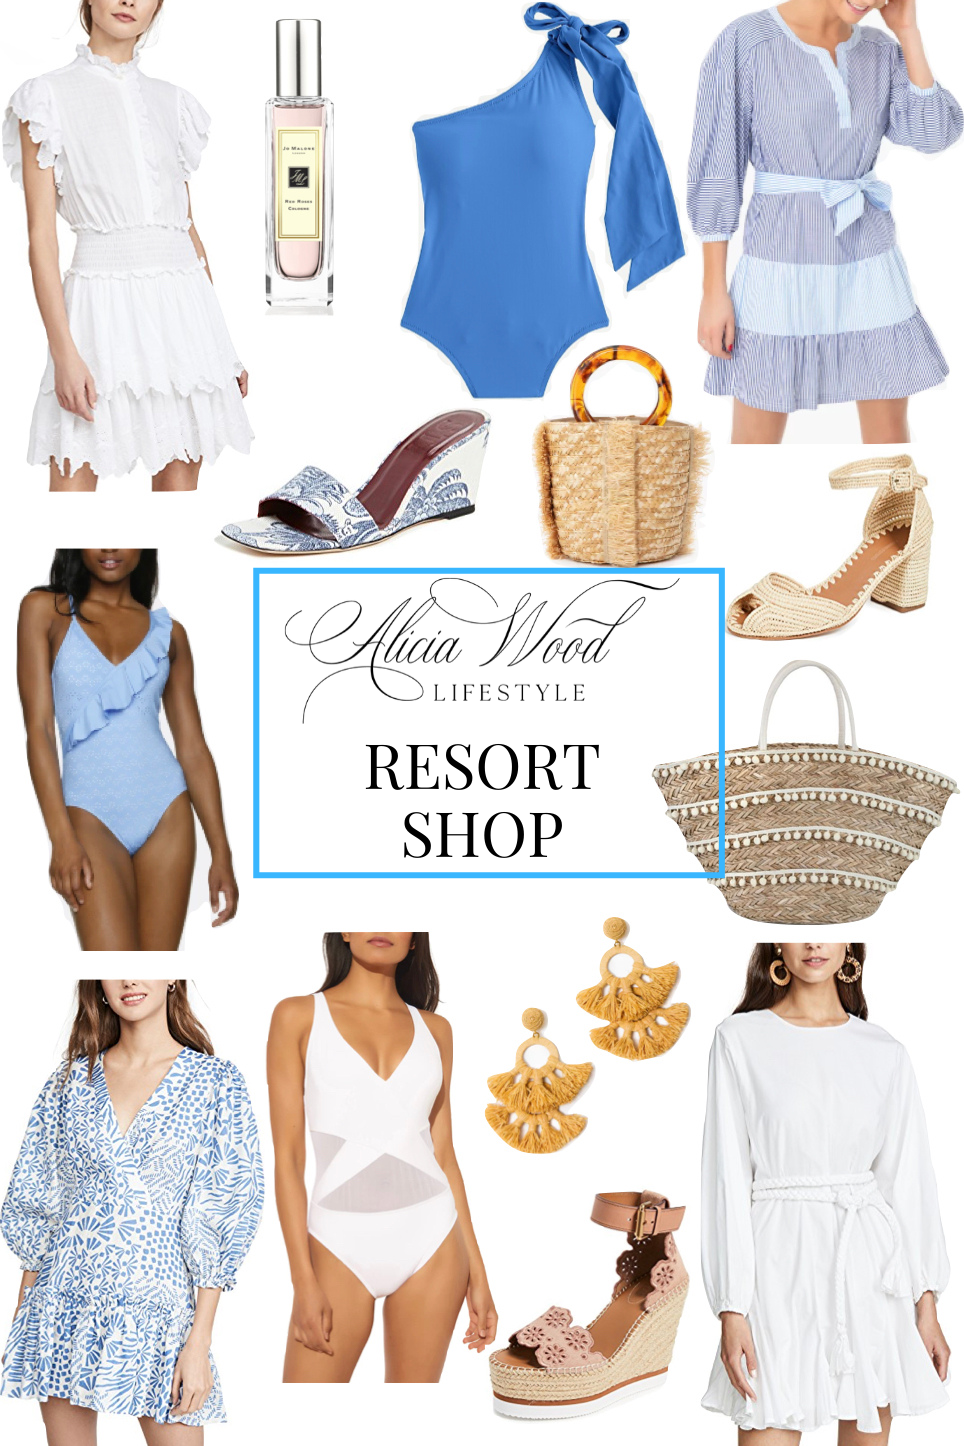 Wanderlust Wednesday: Resort Shop | Warm Weather Getaway Style